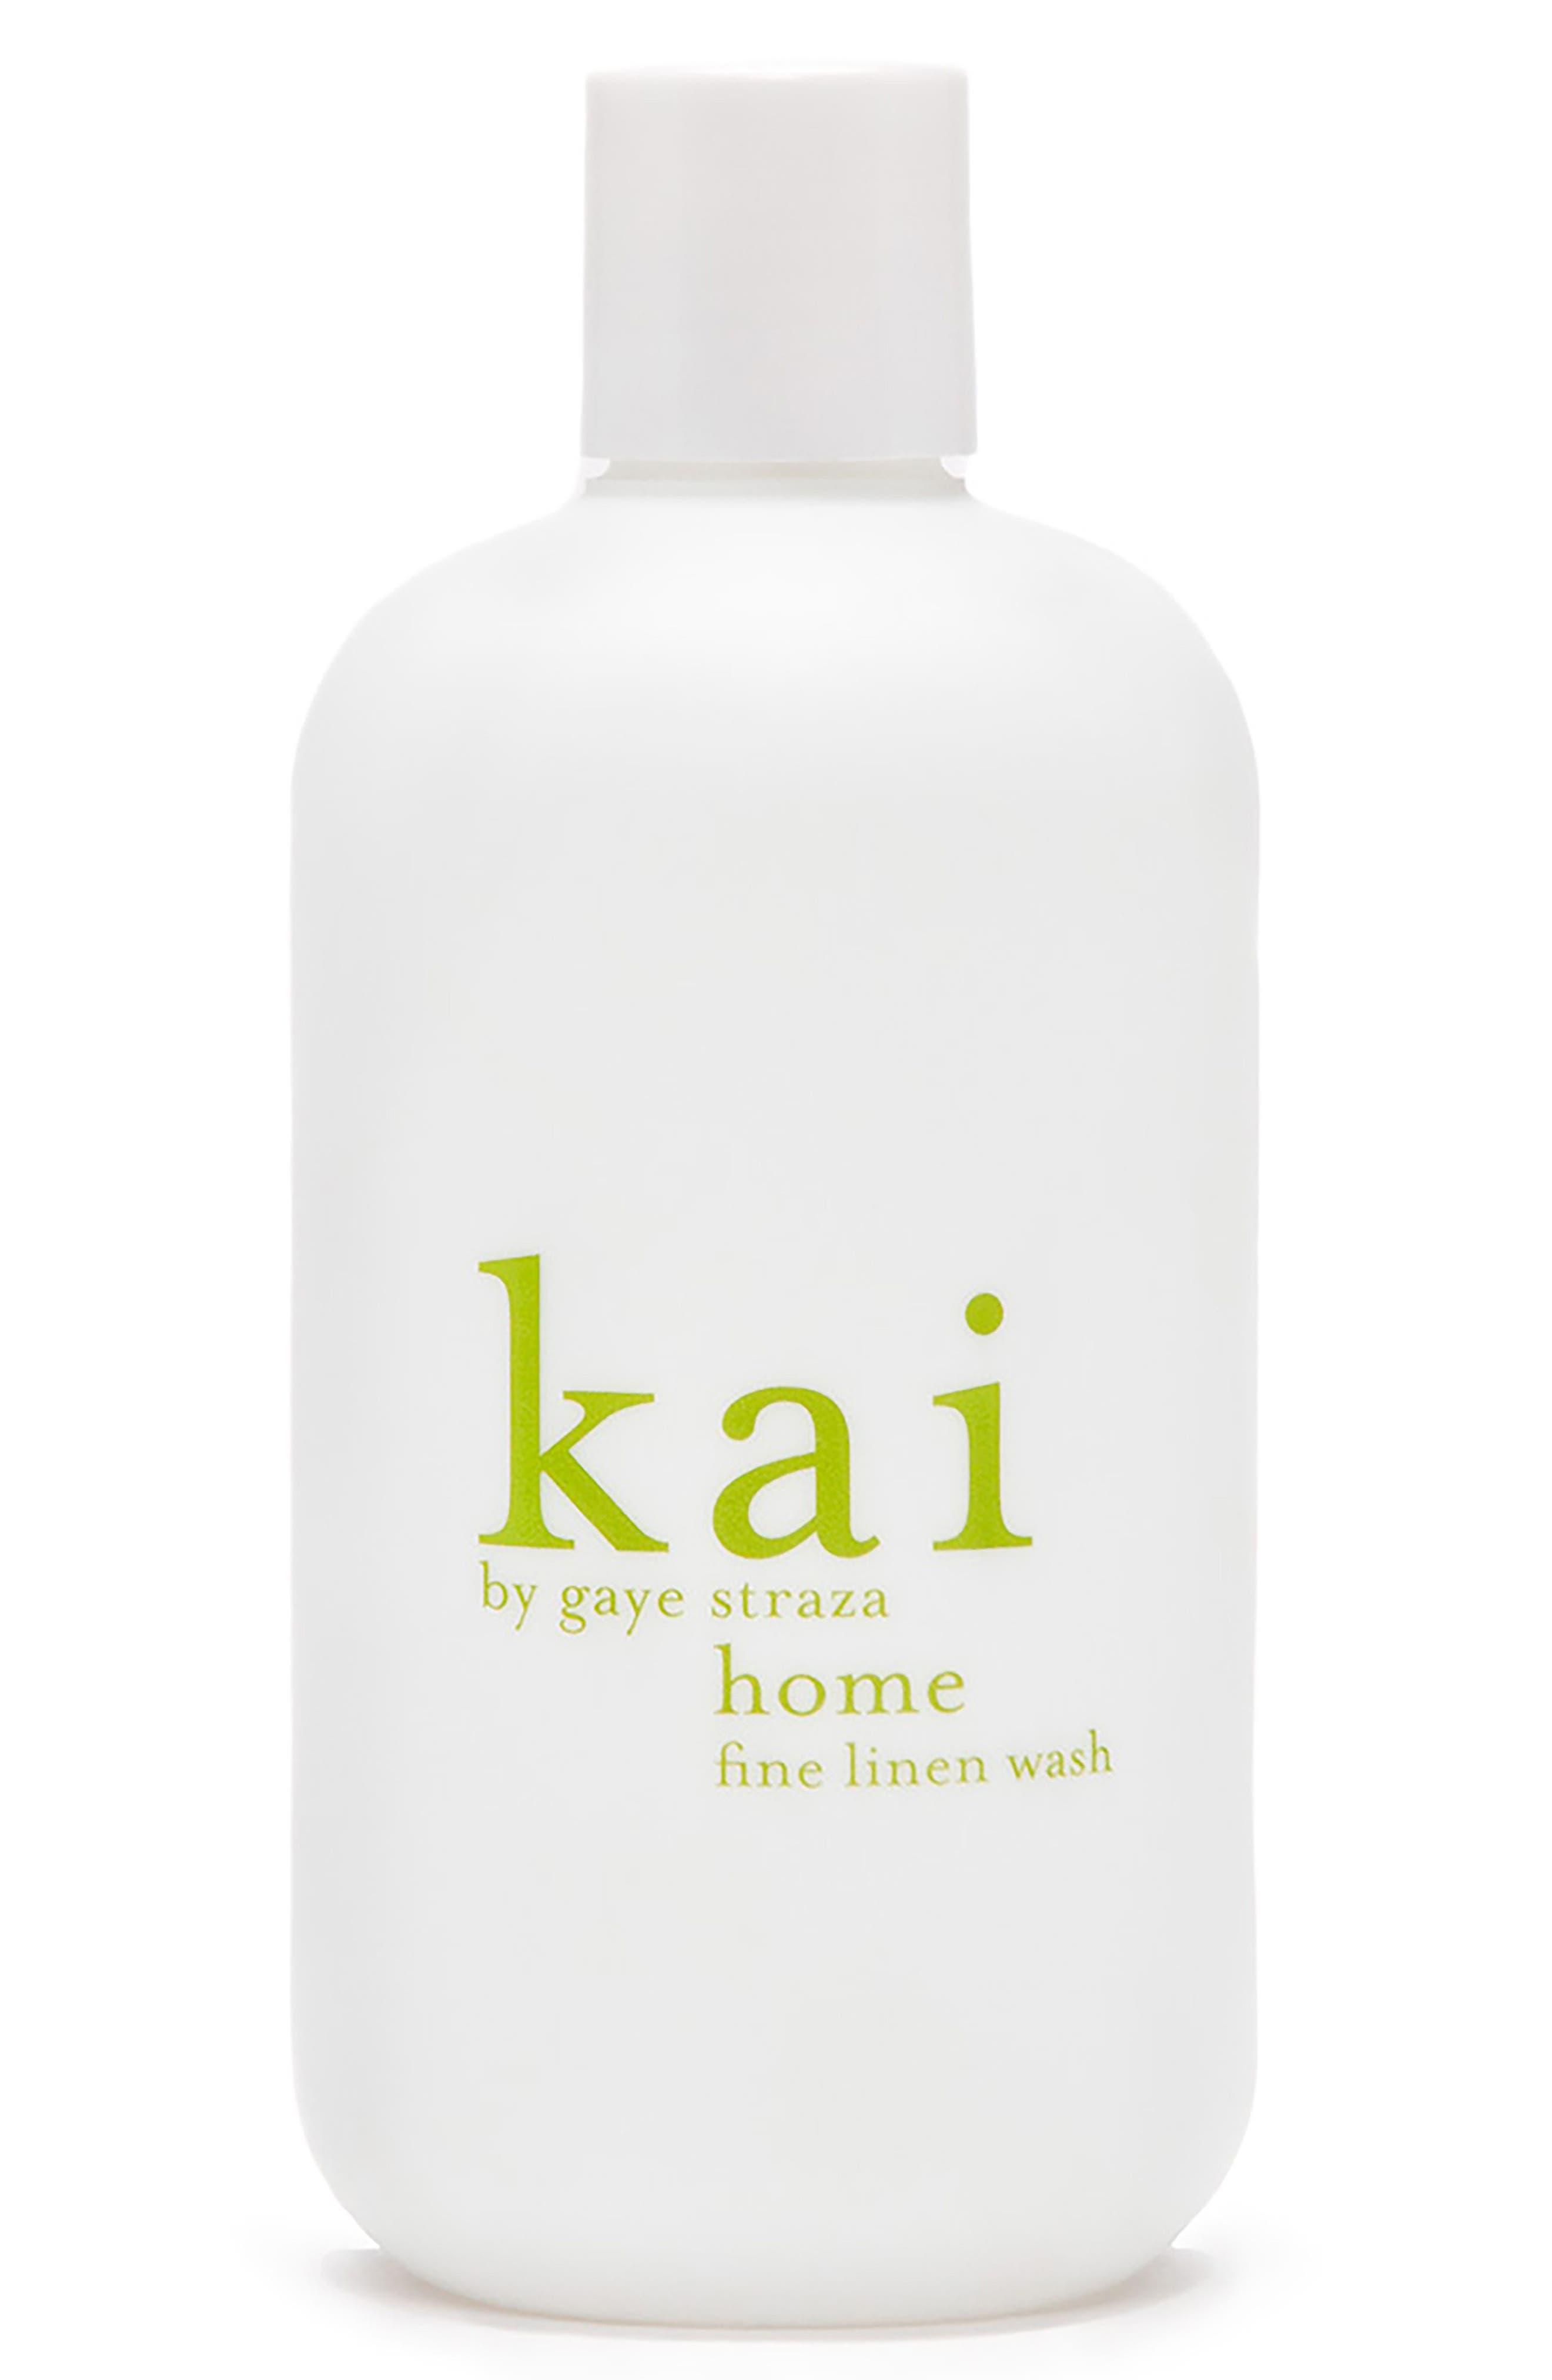 kai 'Home' Fine Linen Wash